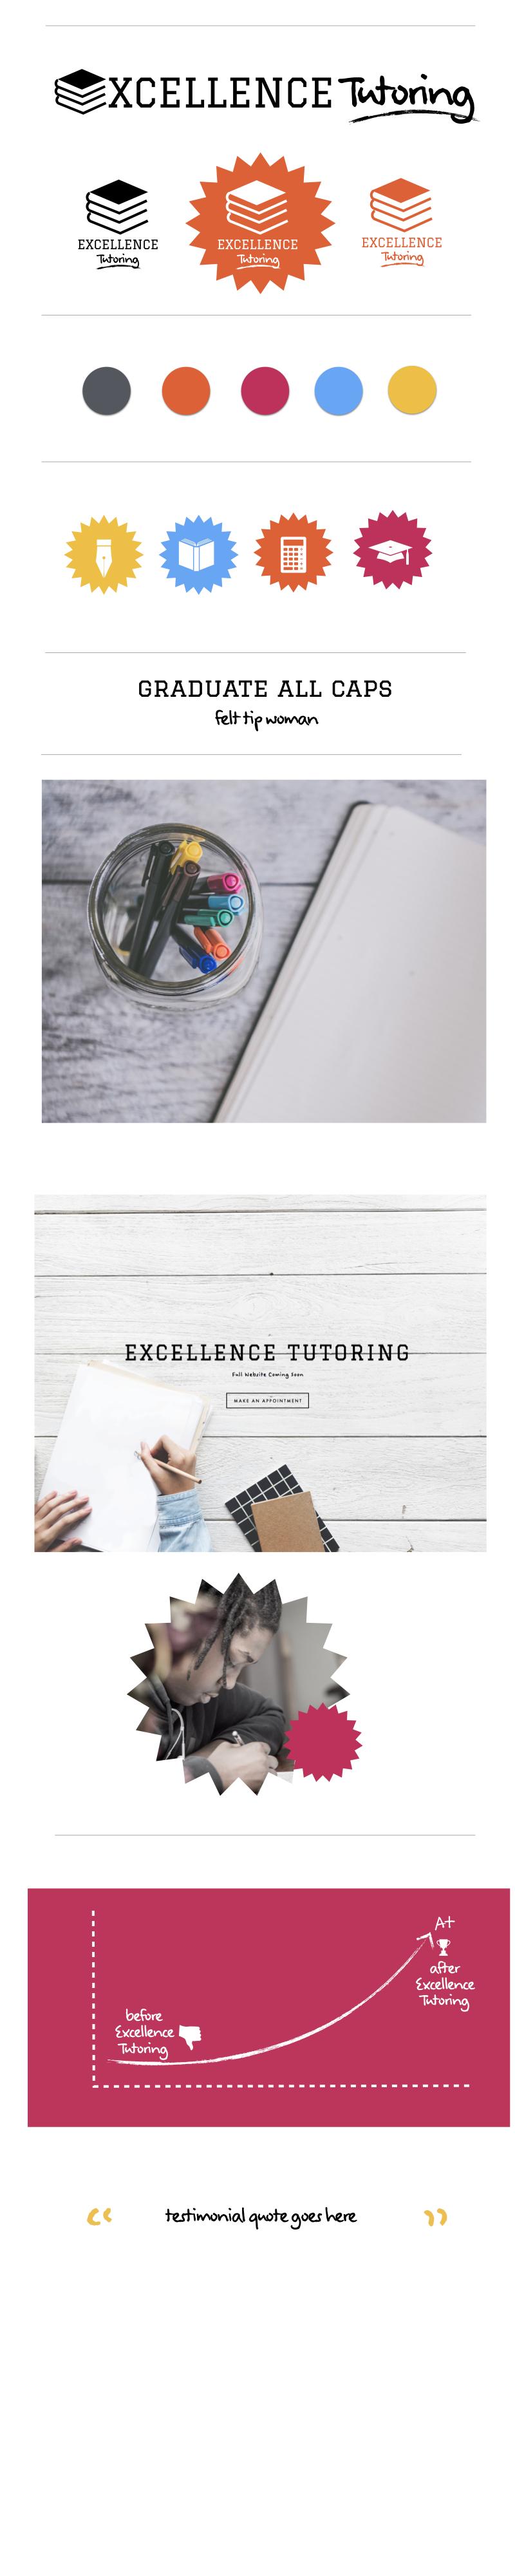 Excellence Tutoring Branding Template.001.jpeg